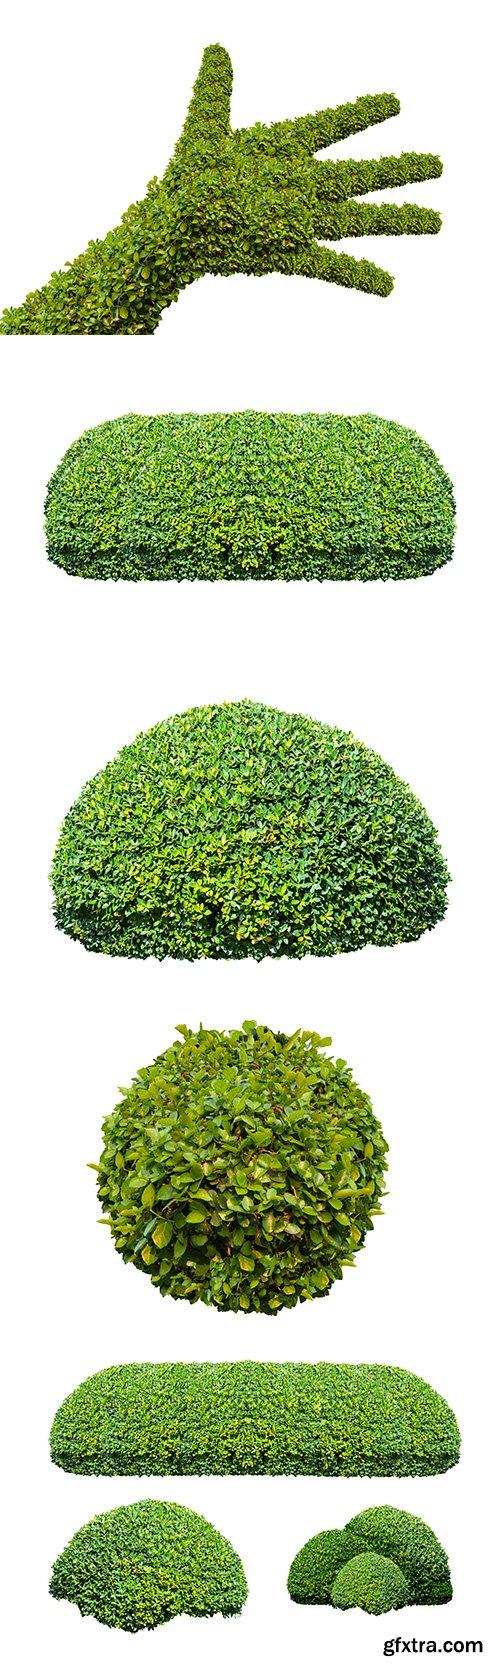 Green Bush Isolated - 15xJPGs